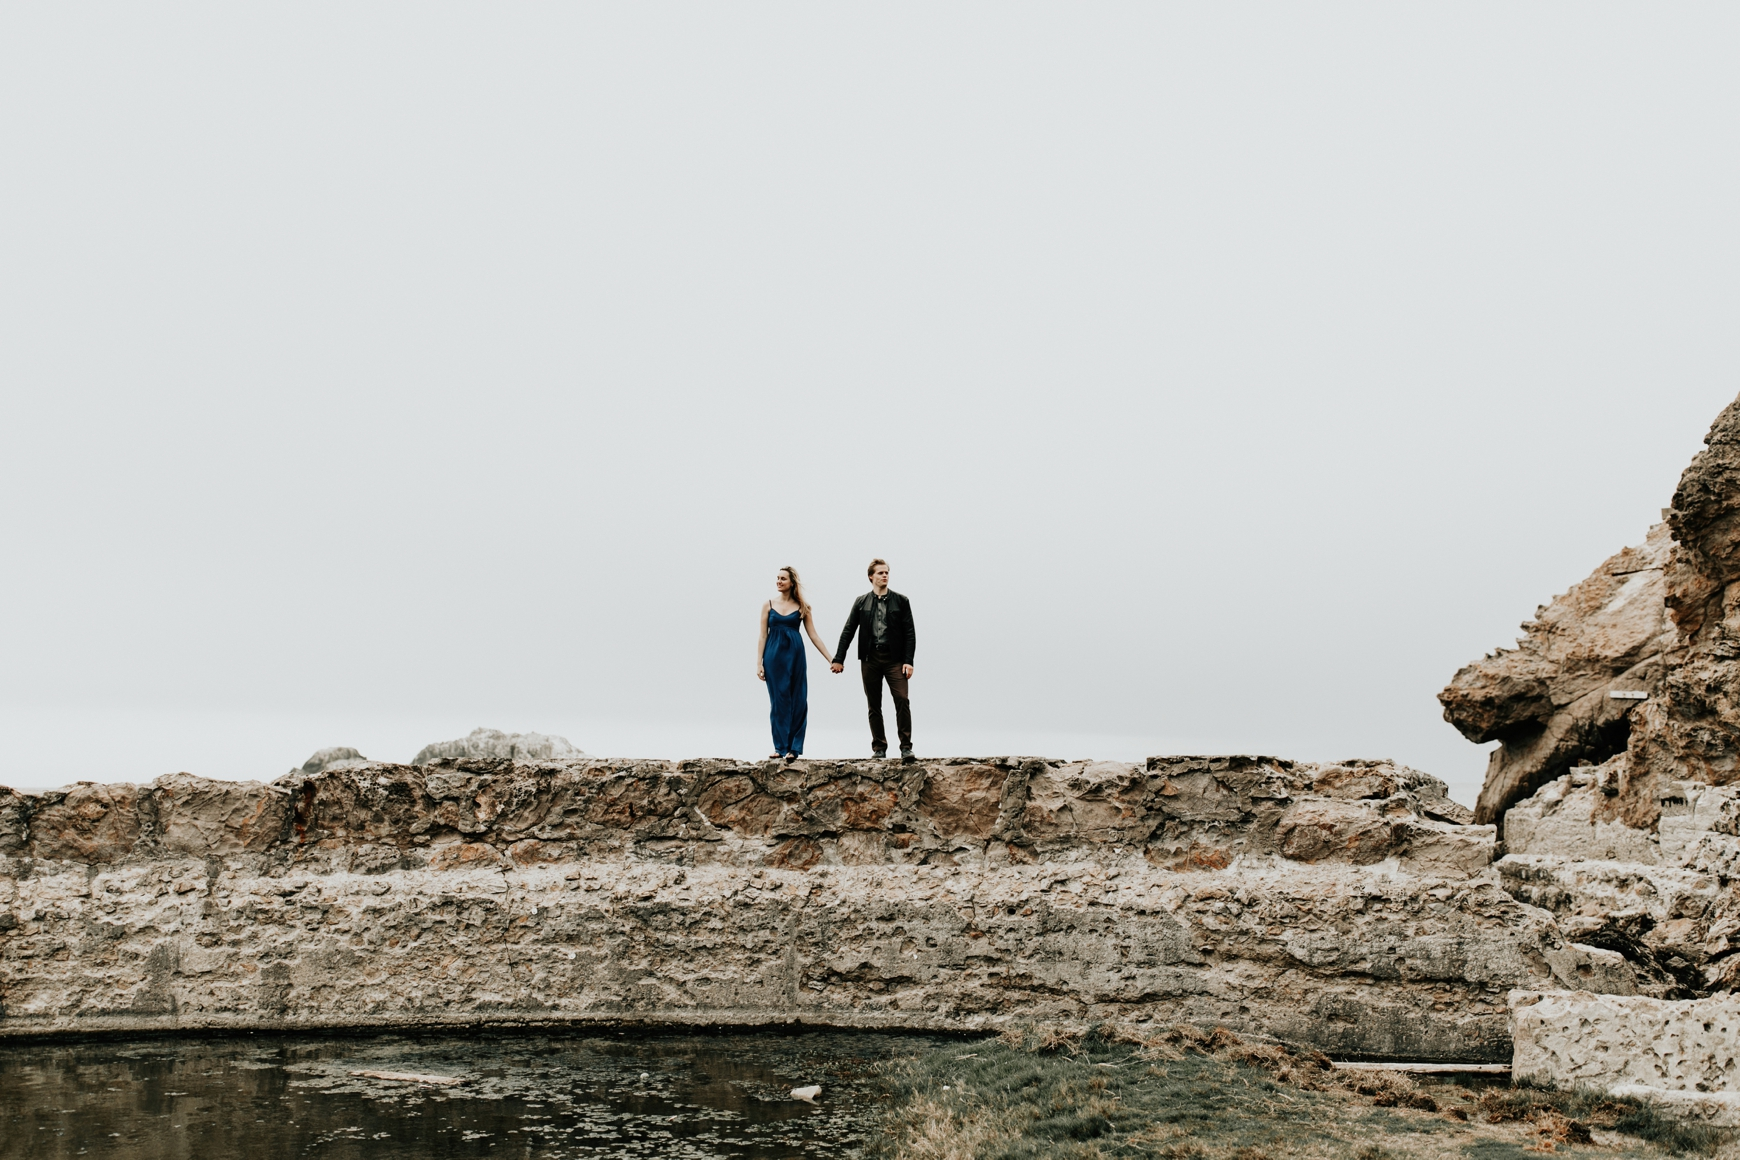 Sutro Baths Engagement Jessica & Ian Emily Magers Photography-18Emily Magers Photography.jpg